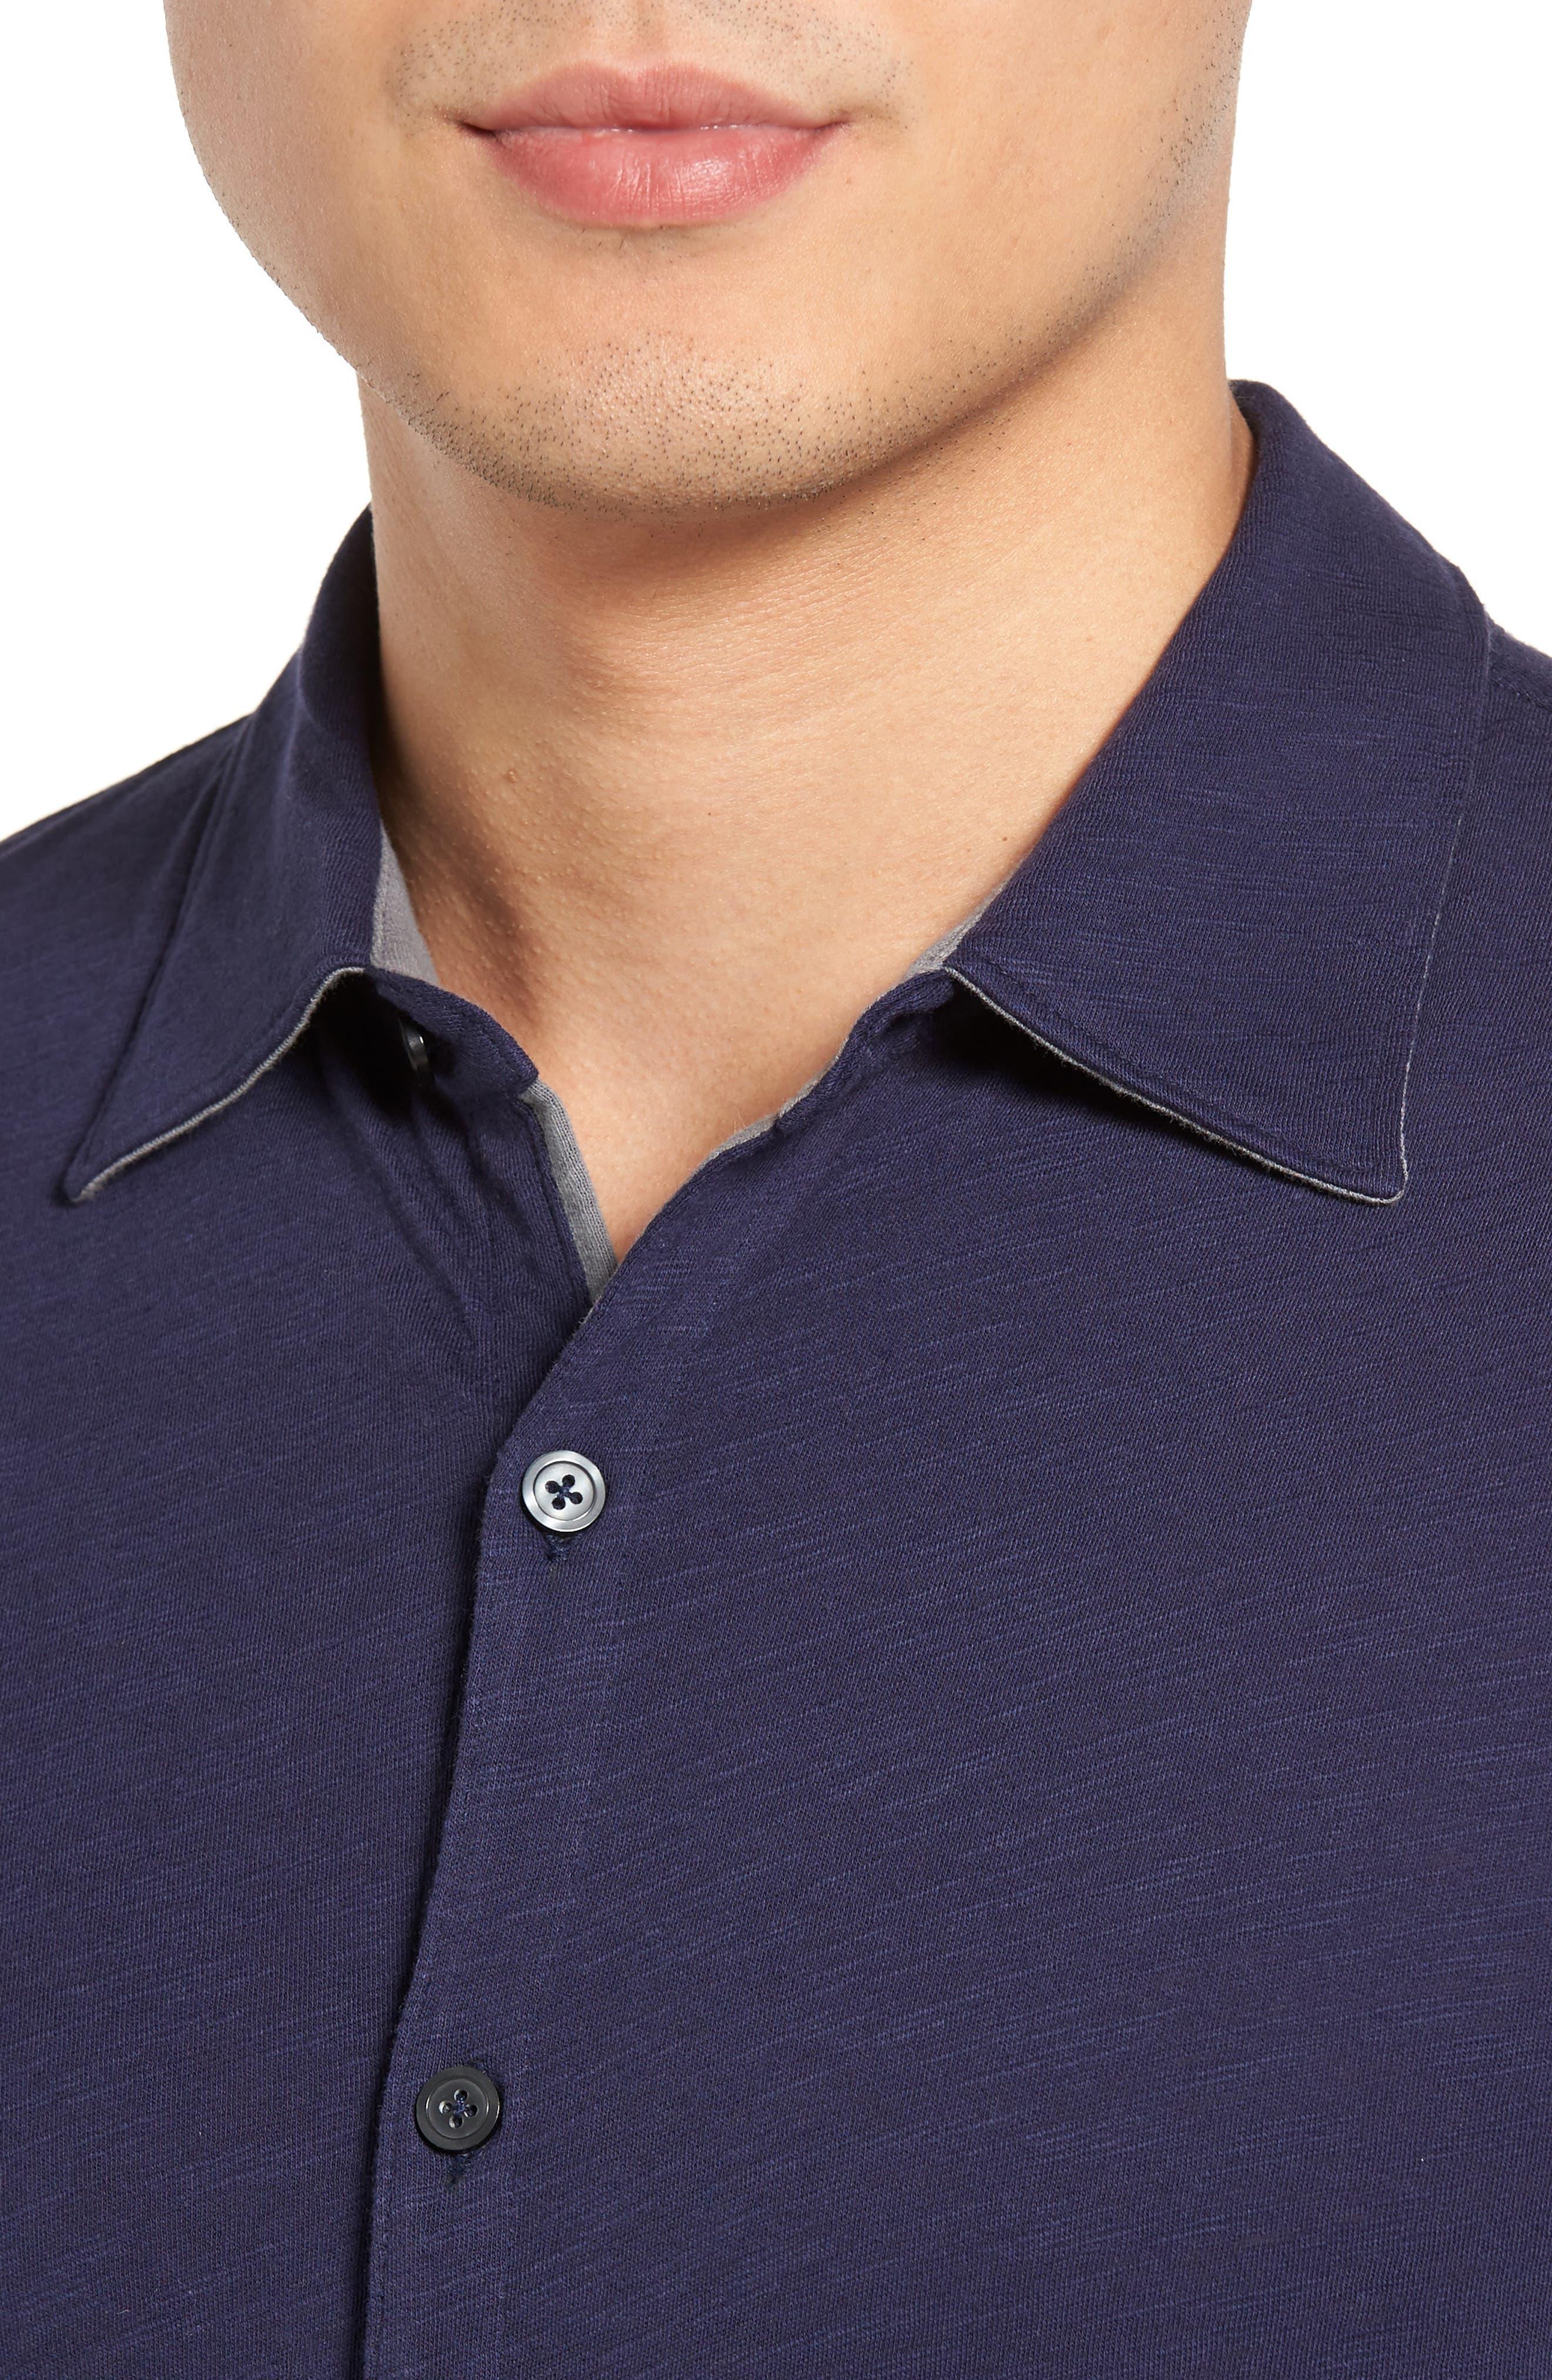 Camara Trim Fit Knit Sport Shirt,                             Alternate thumbnail 11, color,